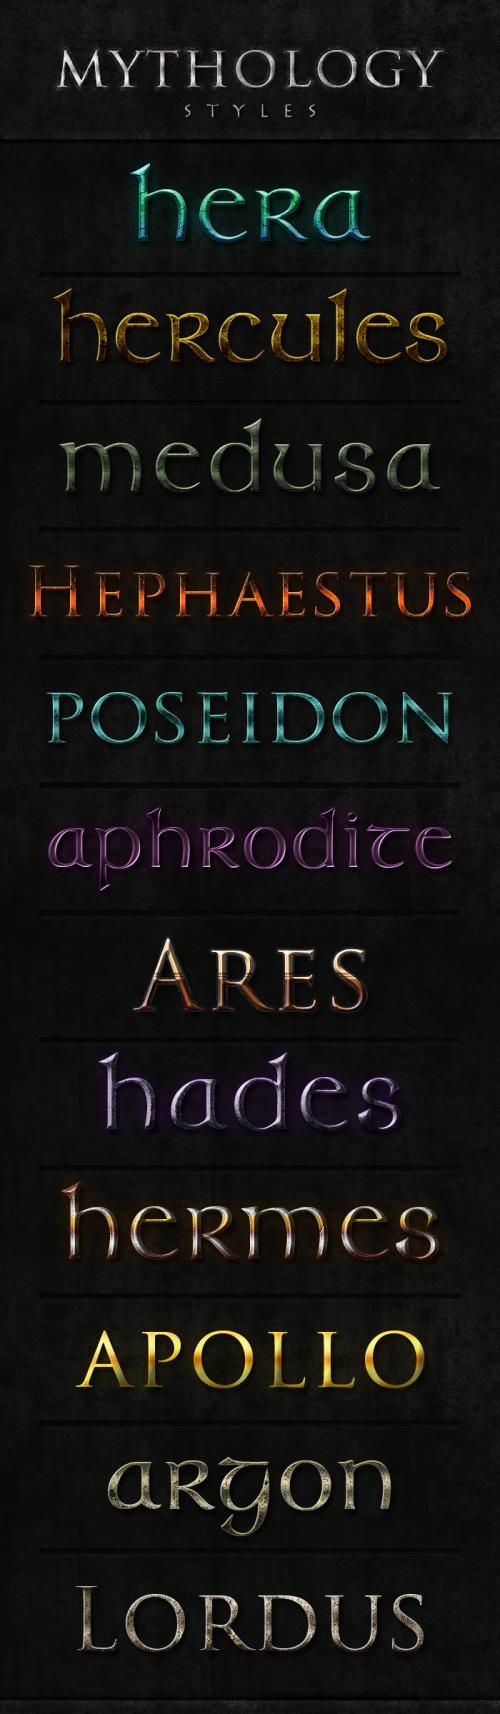 Mythology Styles